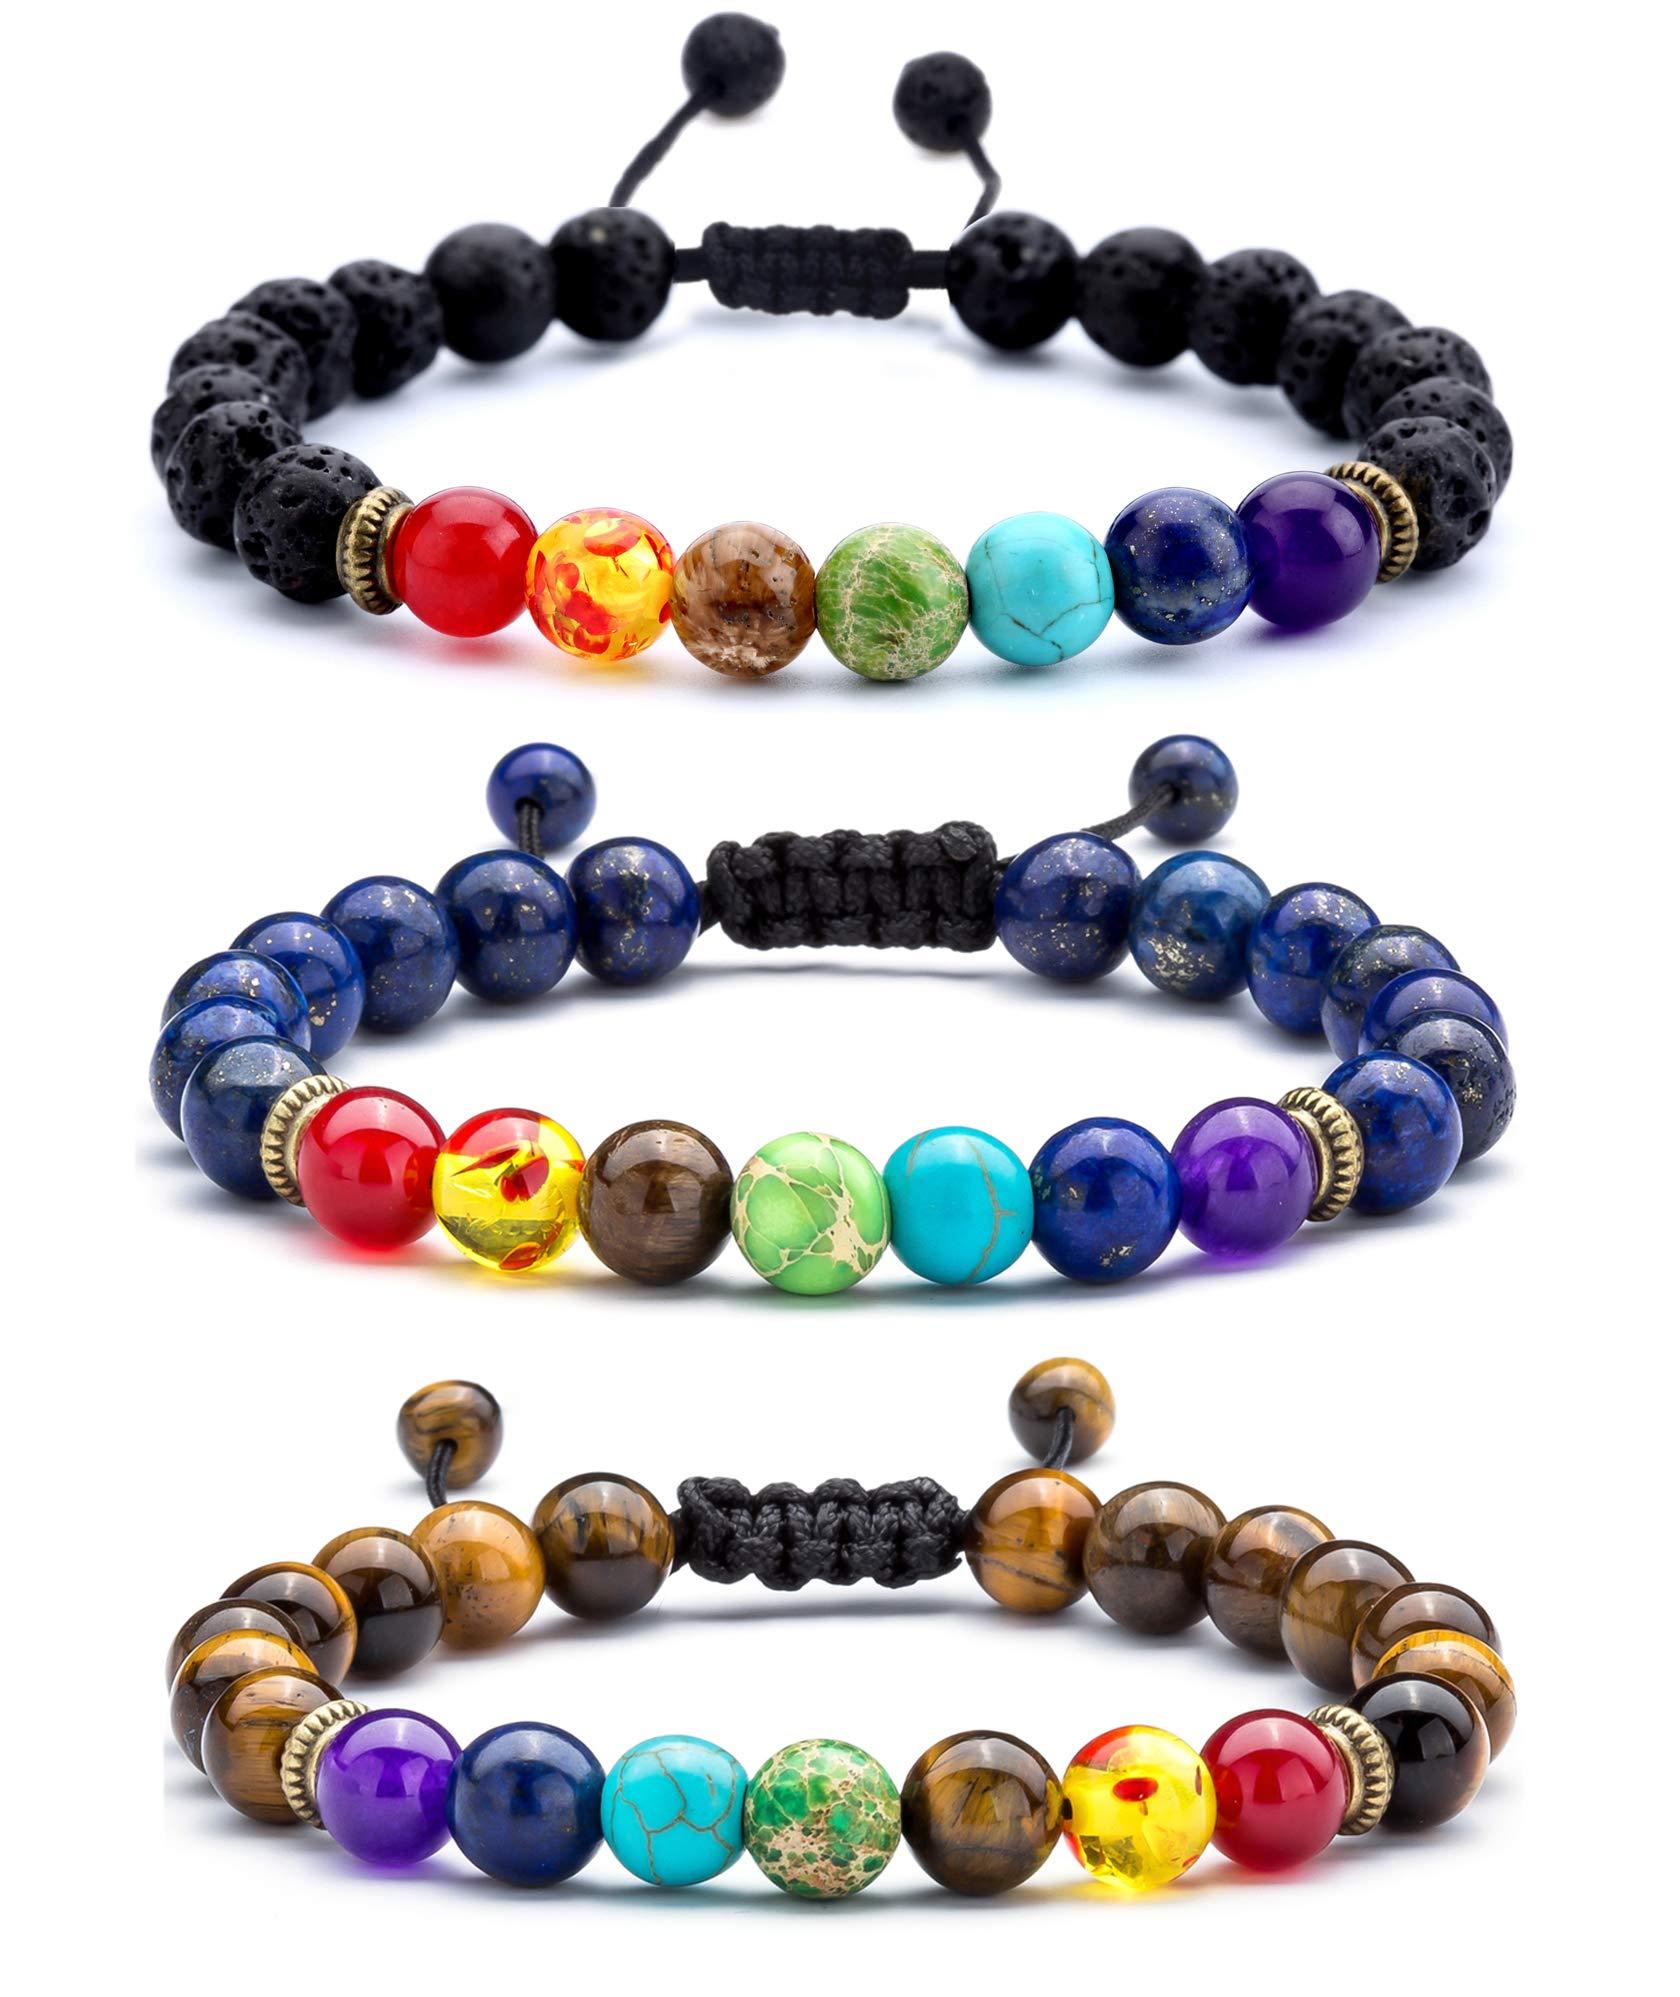 Hamoery Men Women 8mm Lava Rock 7 Chakras Diffuser Bracelet Braided Rope Natural Stone Yoga Beads Bracelet Bangle (3 Pcs Set) by Hamoery